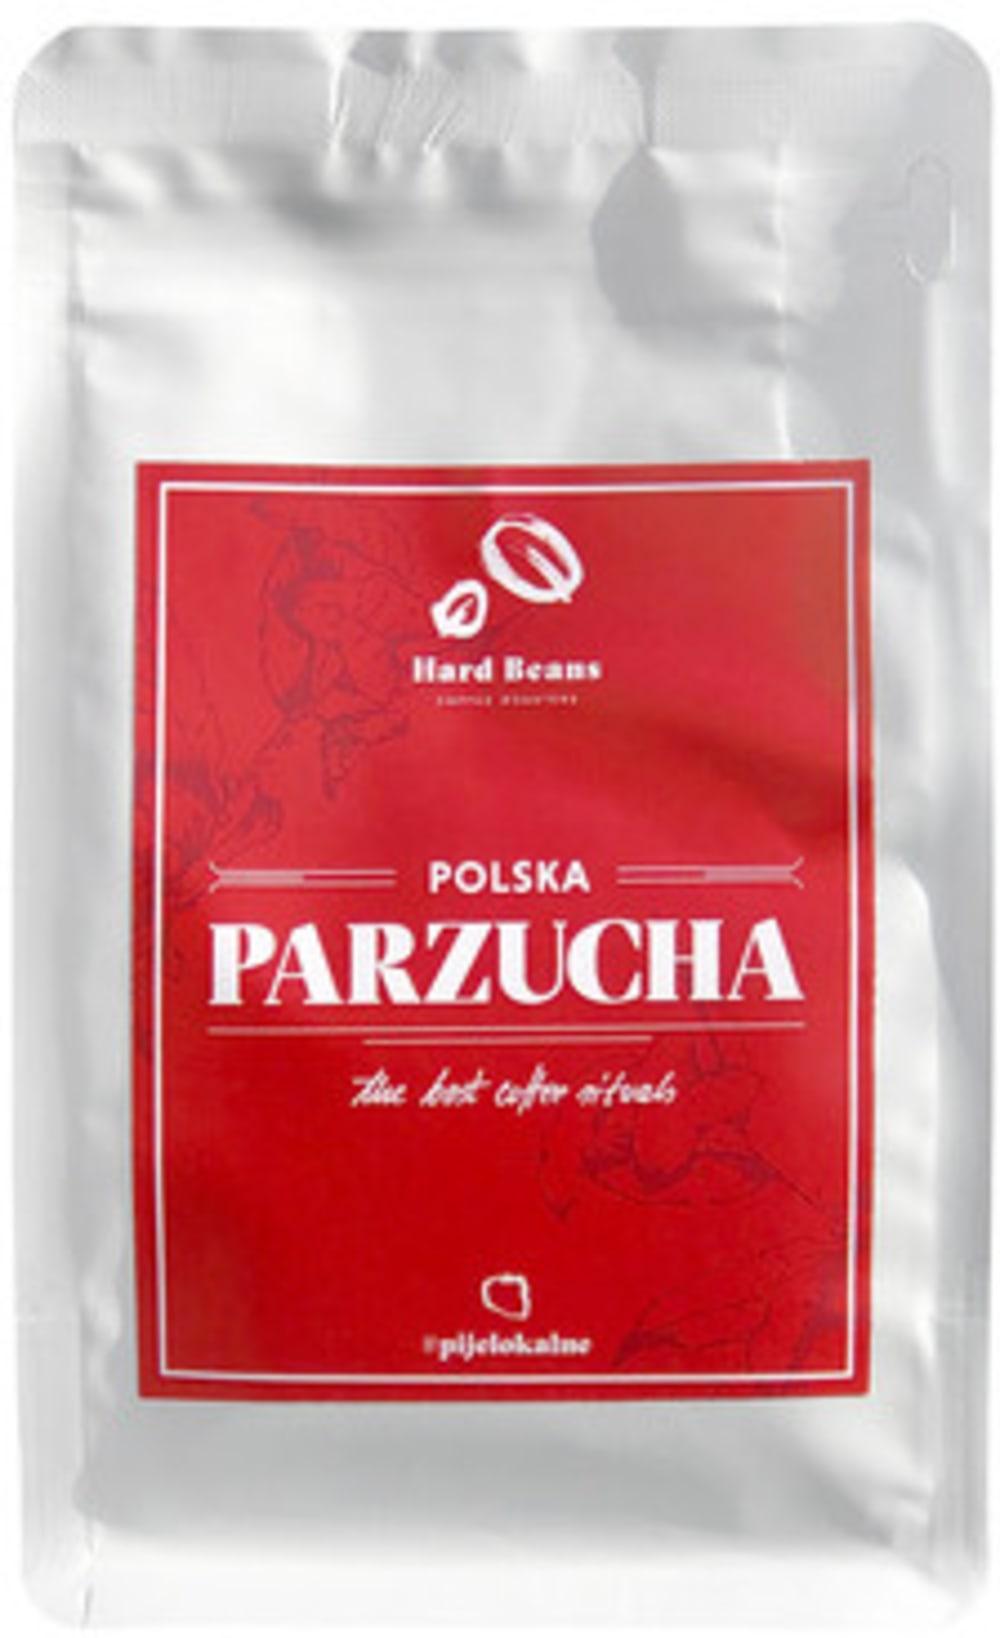 Hard Beans - Polska Parzucha - Kawa mielona